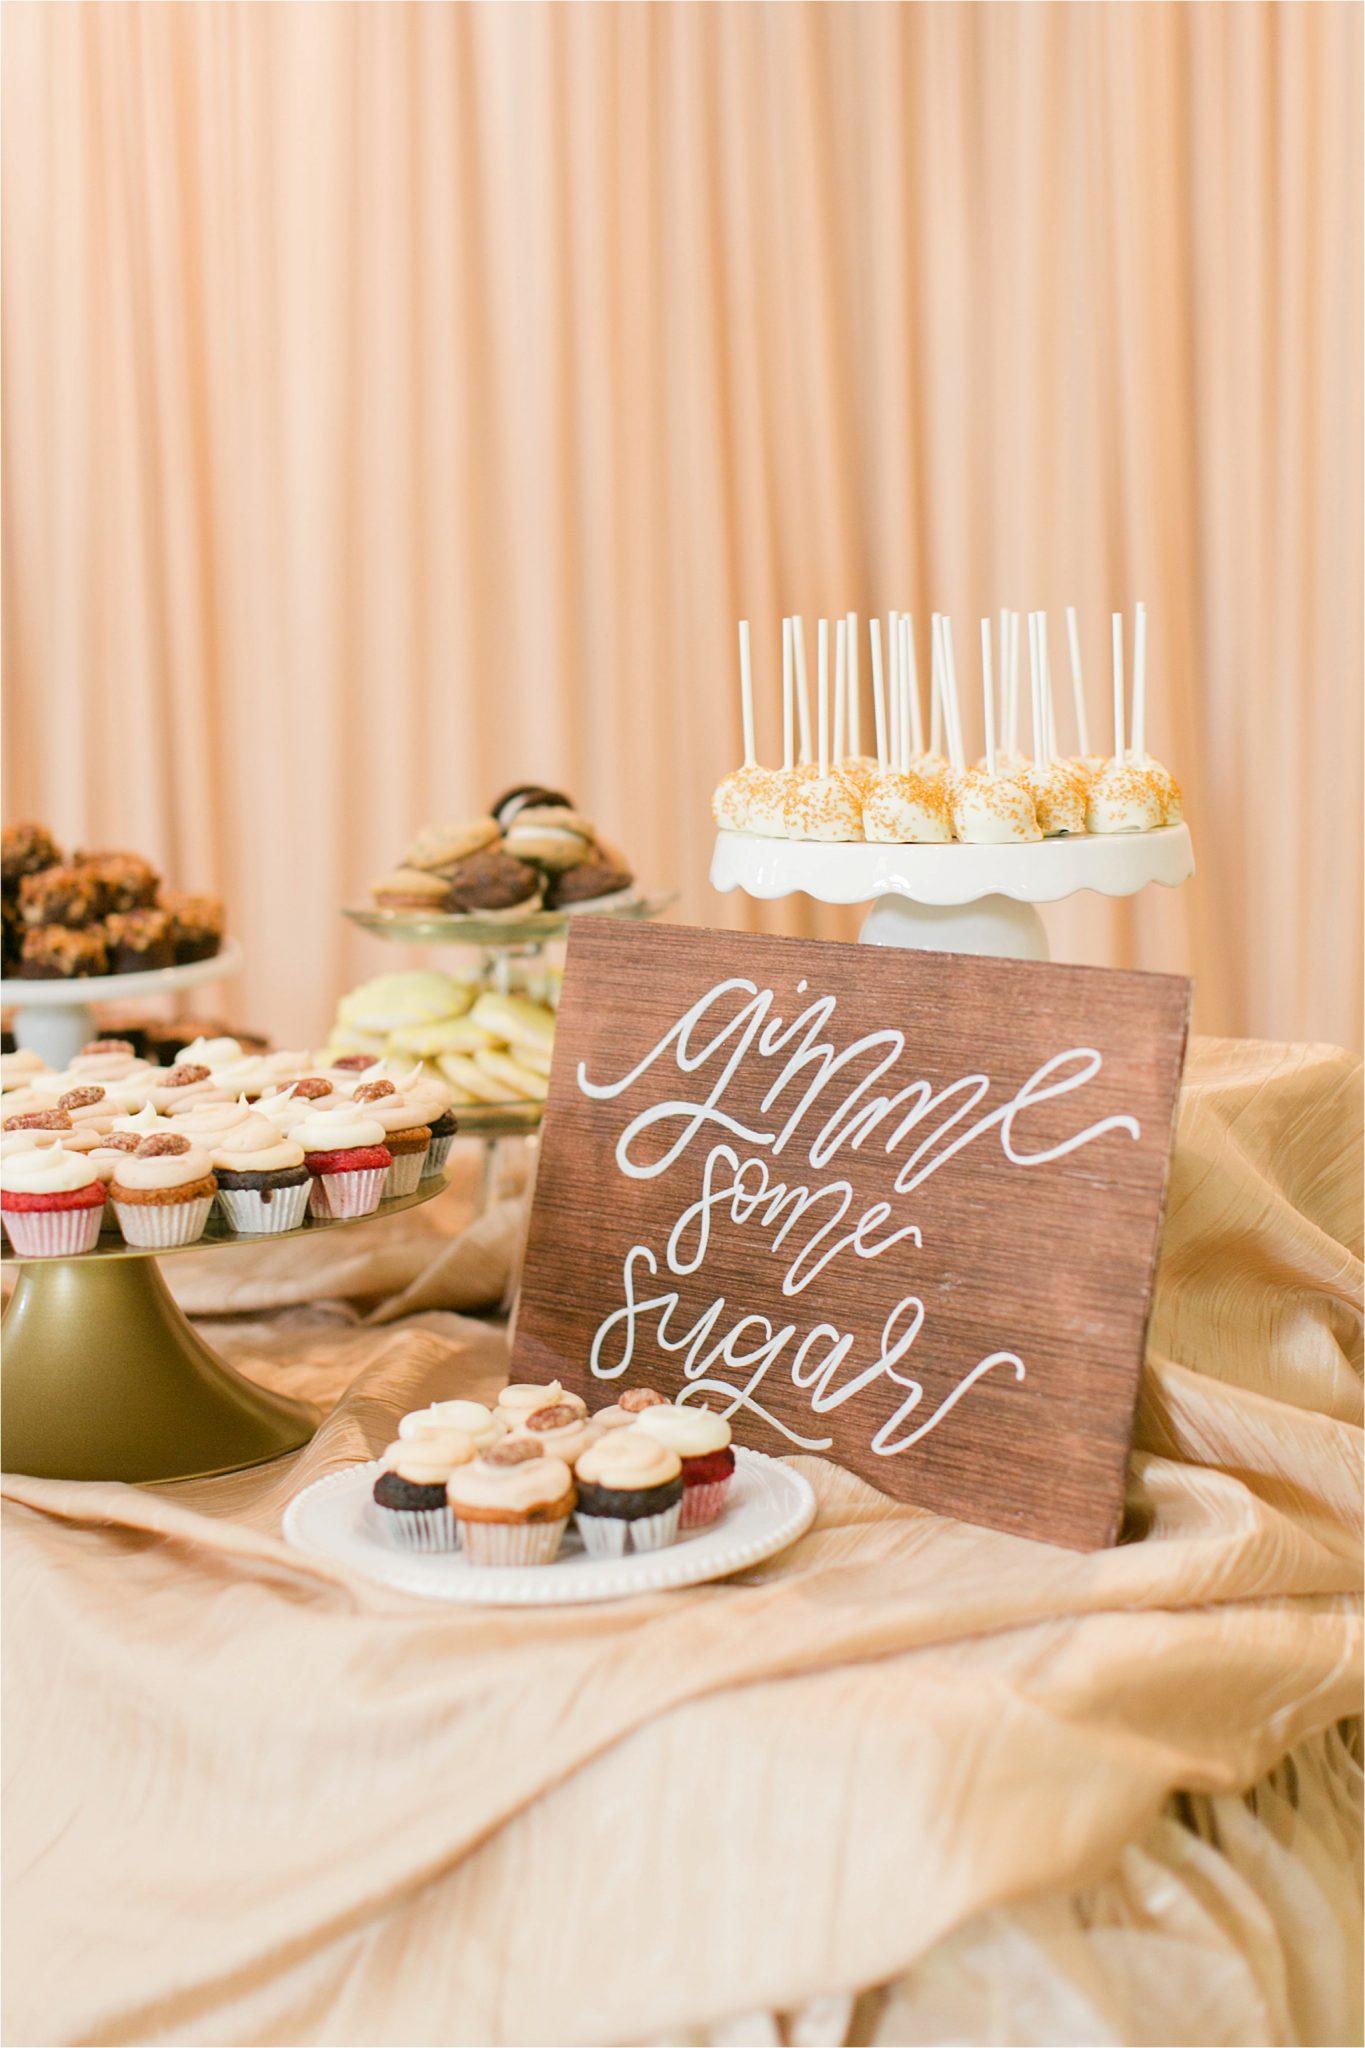 EllenJay Dessert Bar-dessert table-wedding-reception-food ideas-wedding signs-dessert table